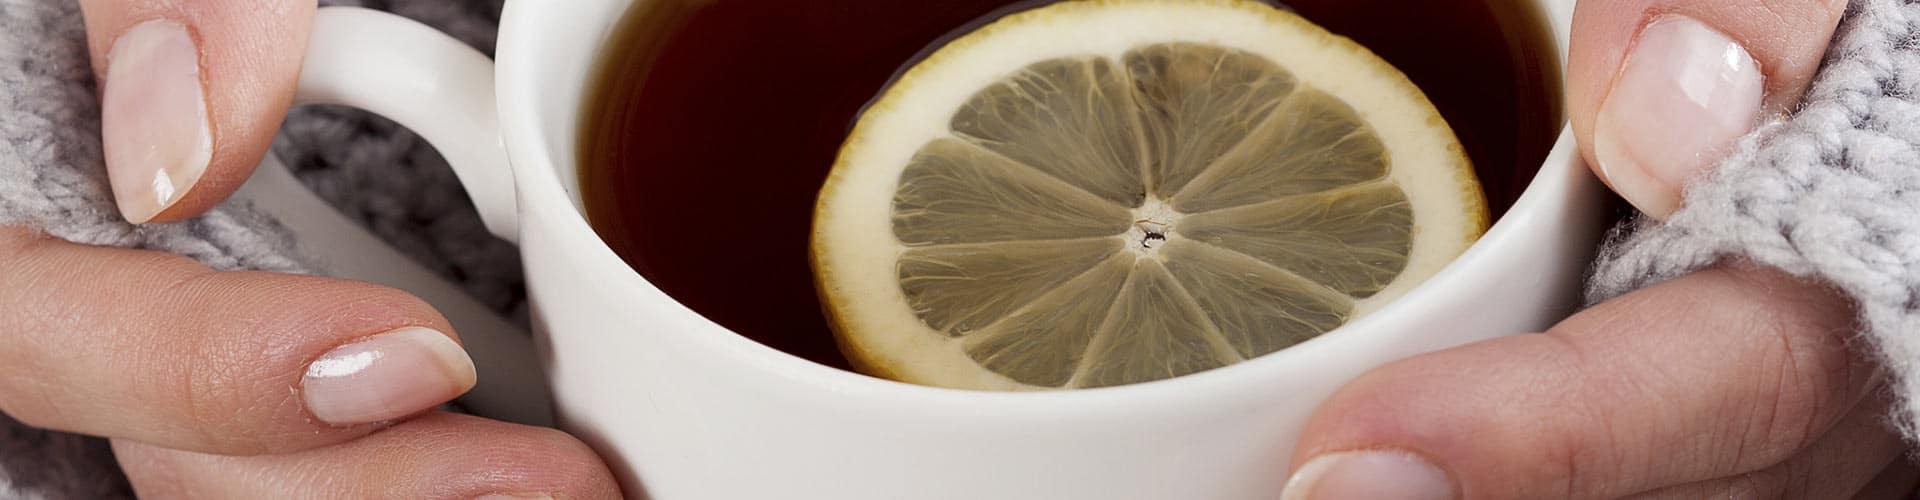 Dieta para eliminar retencion liquidos